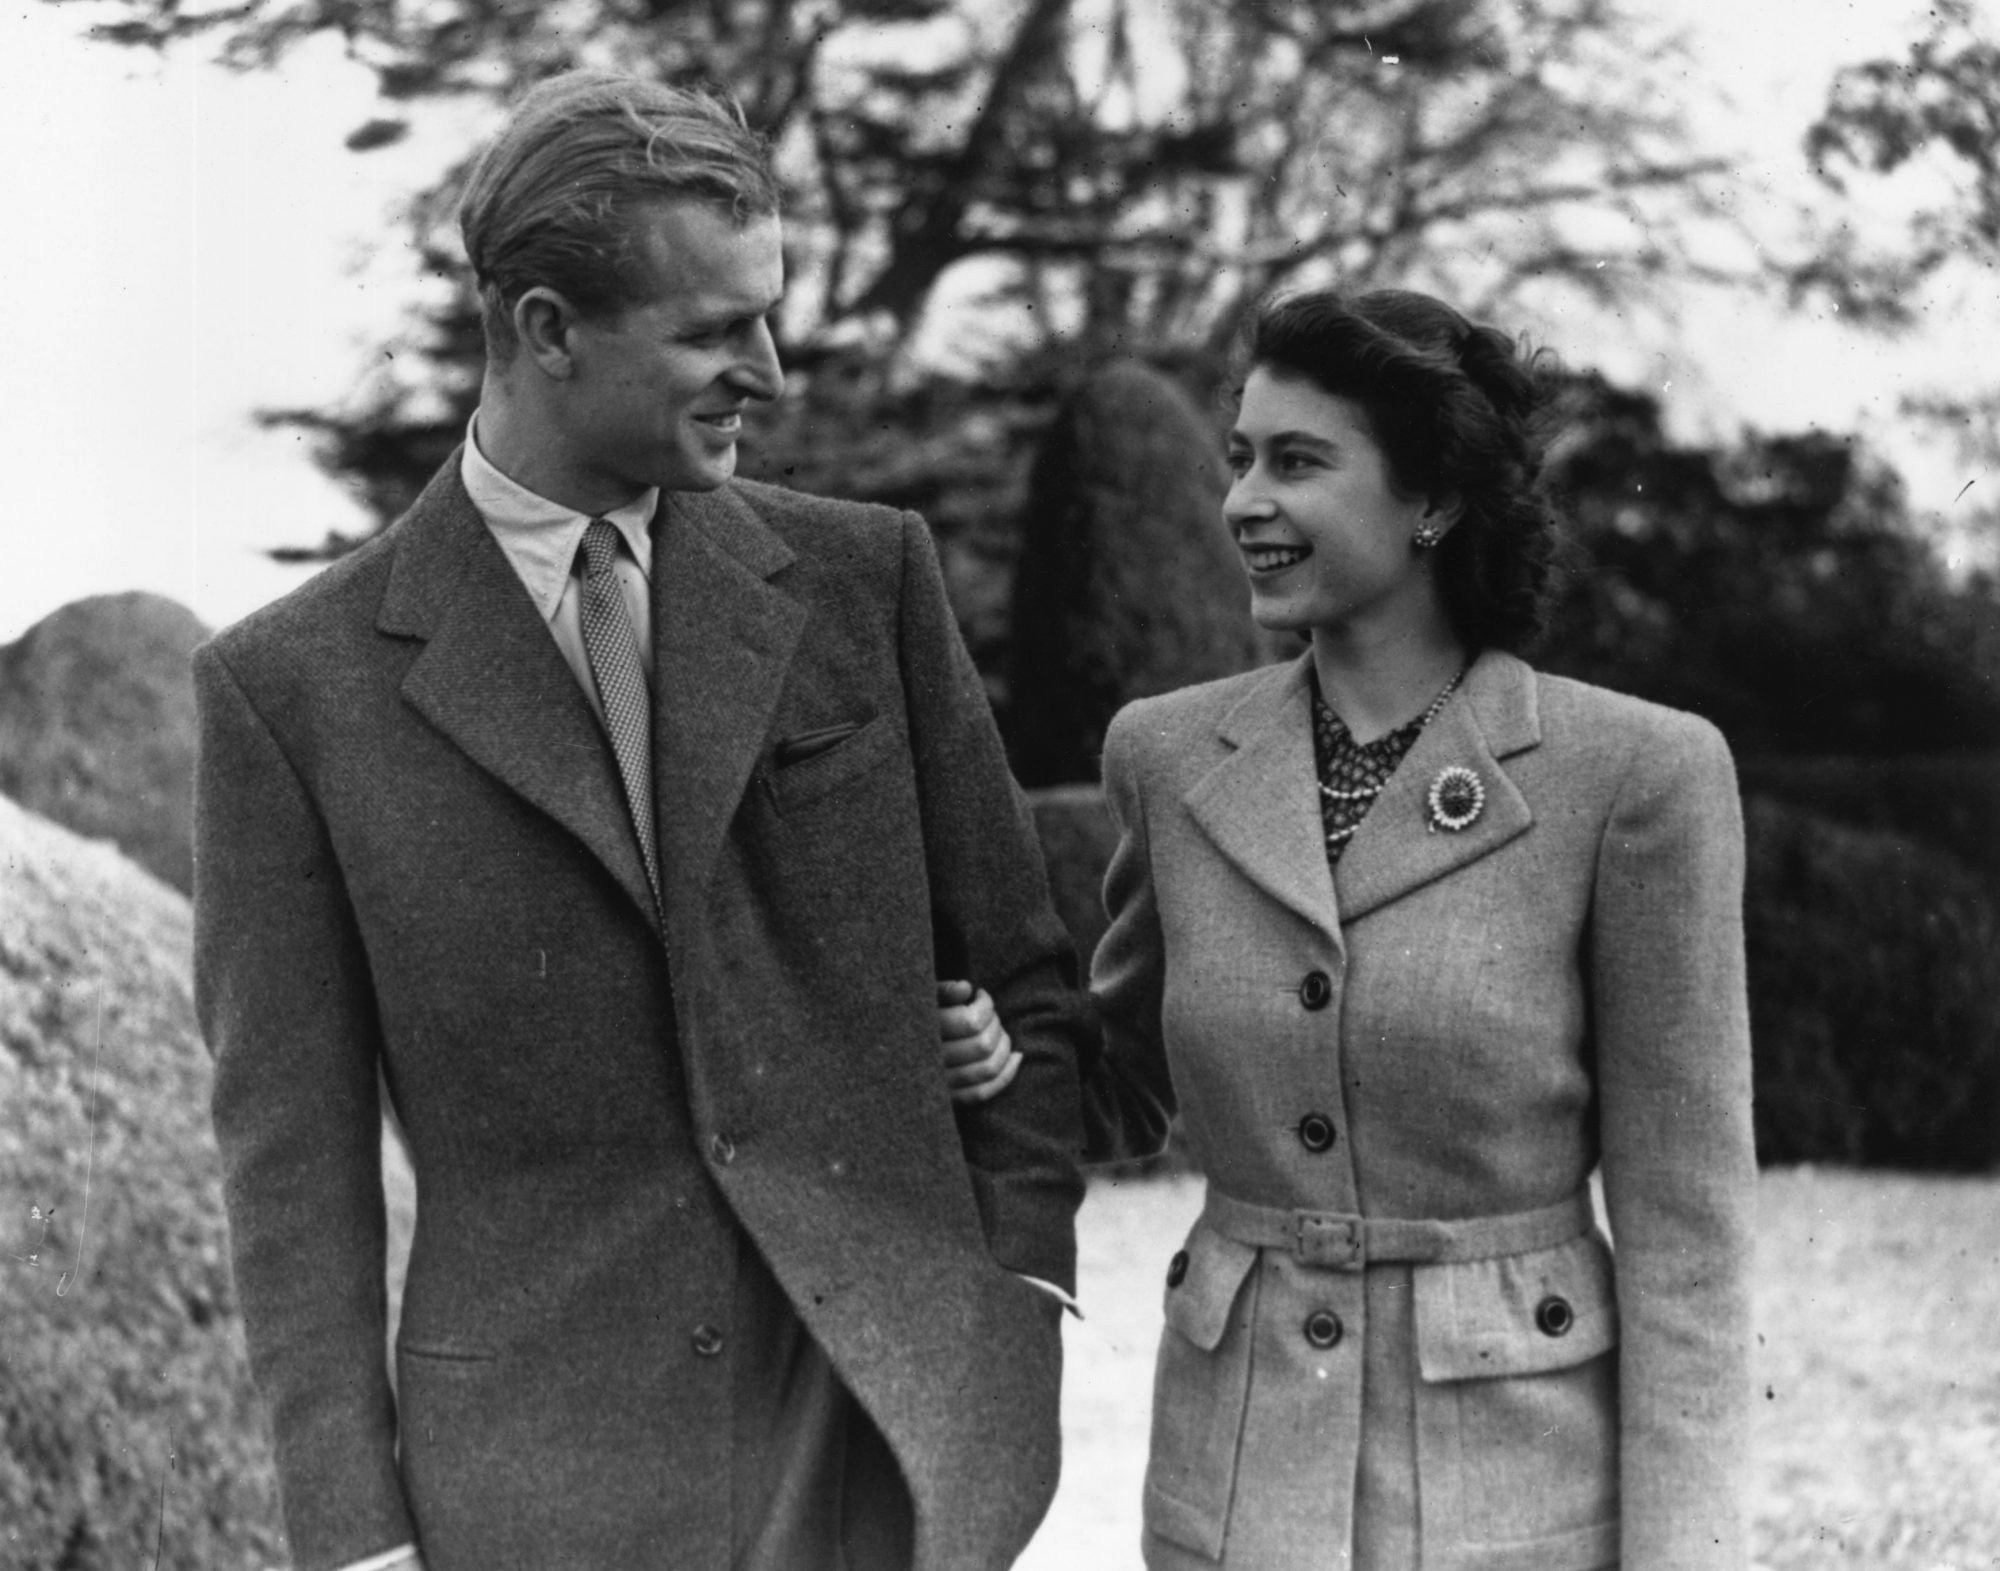 Felipe de Edimburgo y Reina Isabel